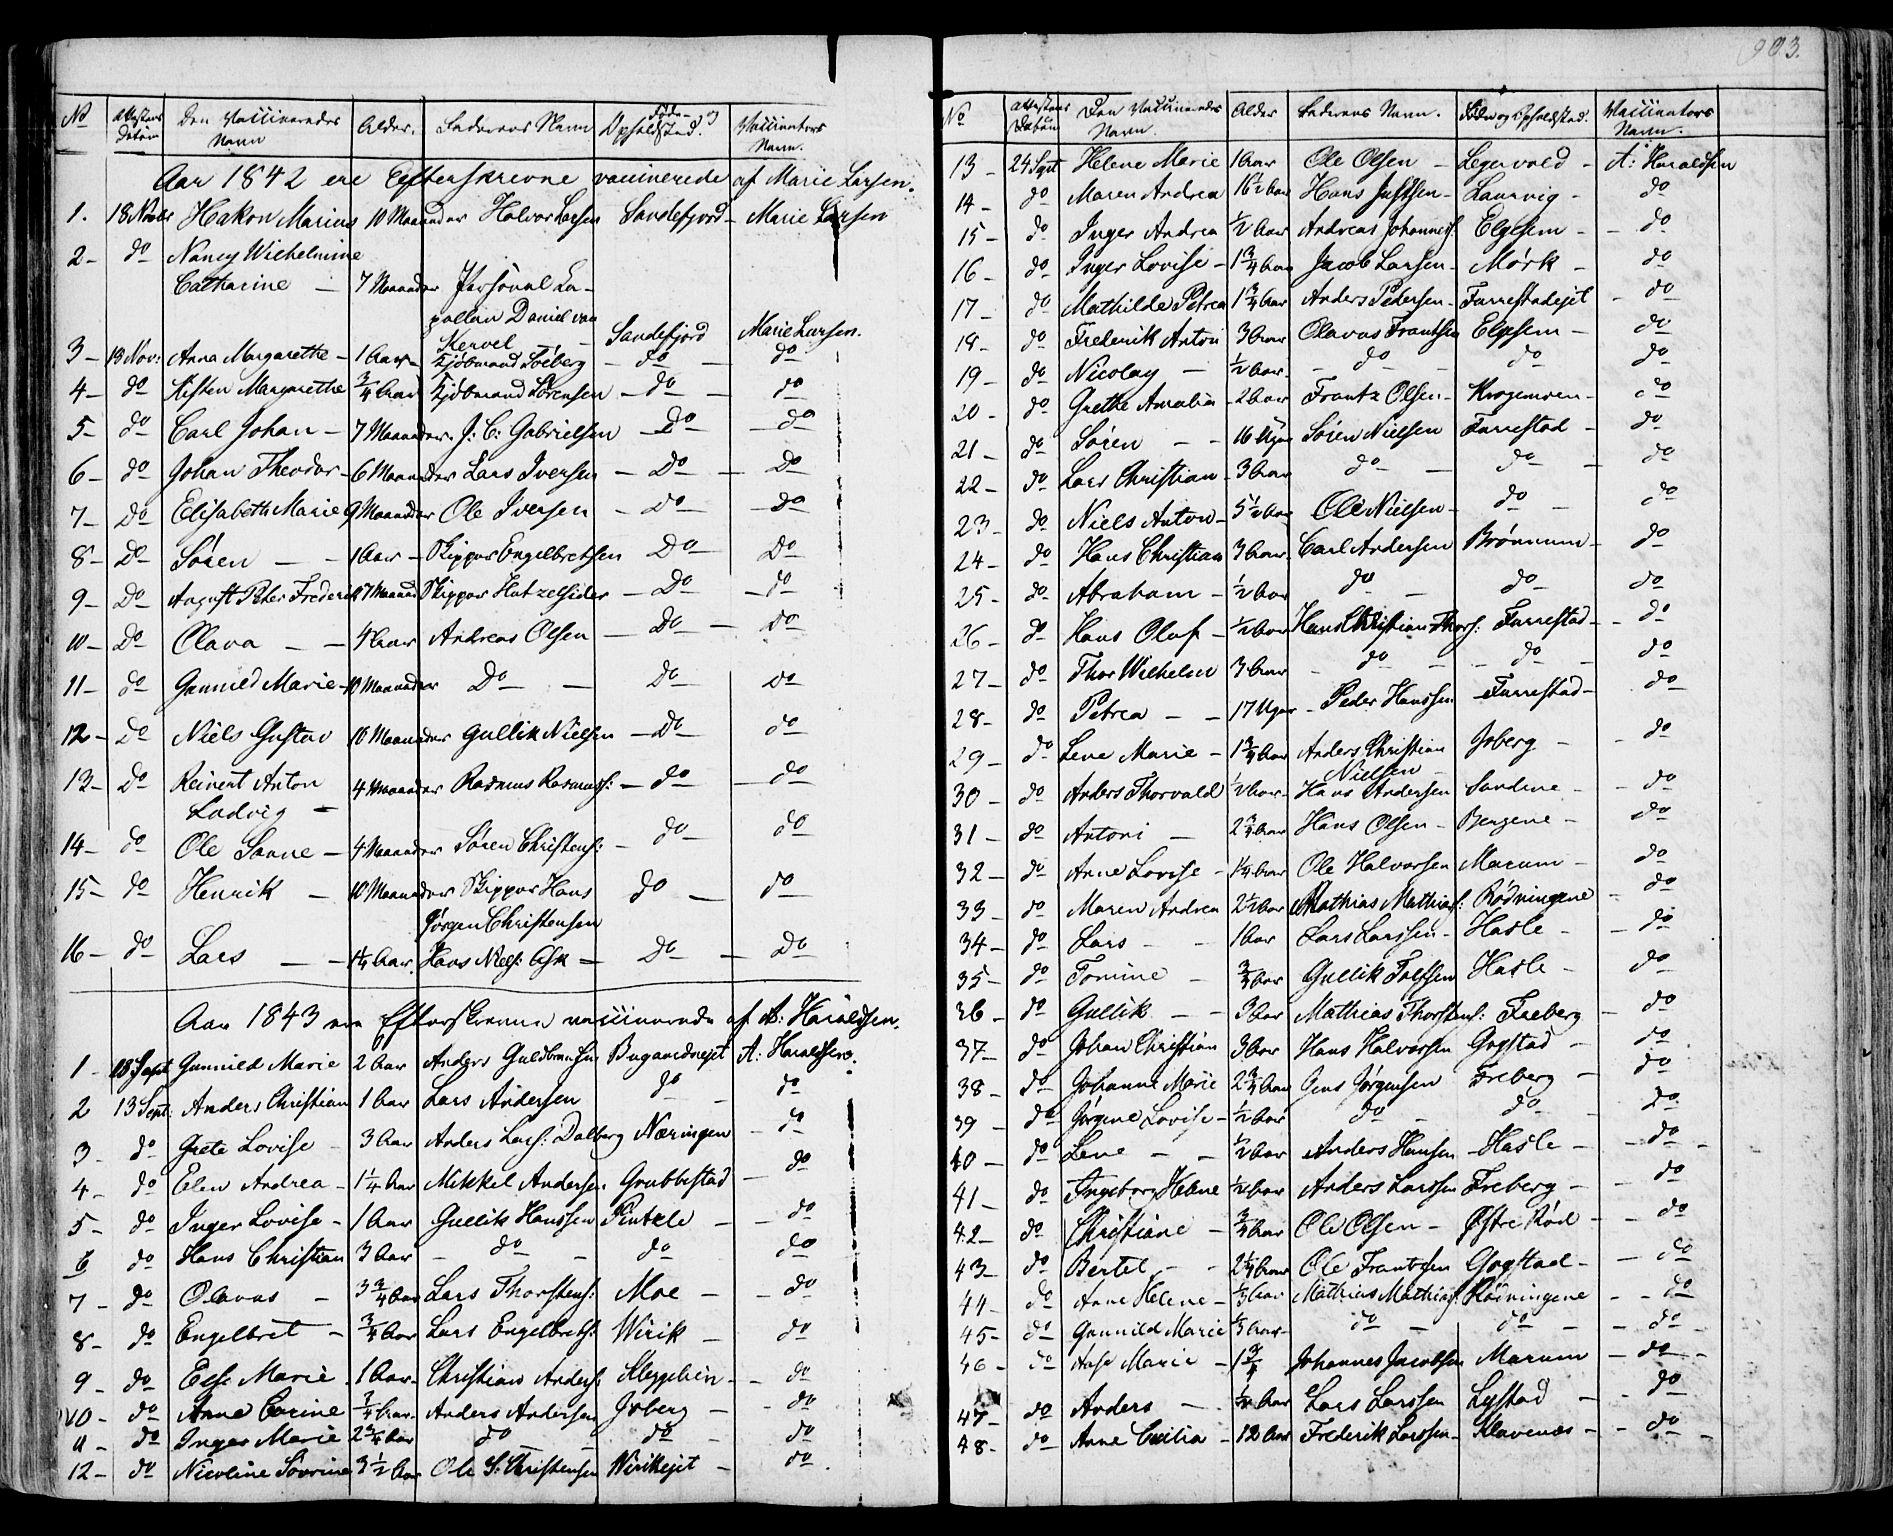 SAKO, Sandar kirkebøker, F/Fa/L0005: Parish register (official) no. 5, 1832-1847, p. 902-903